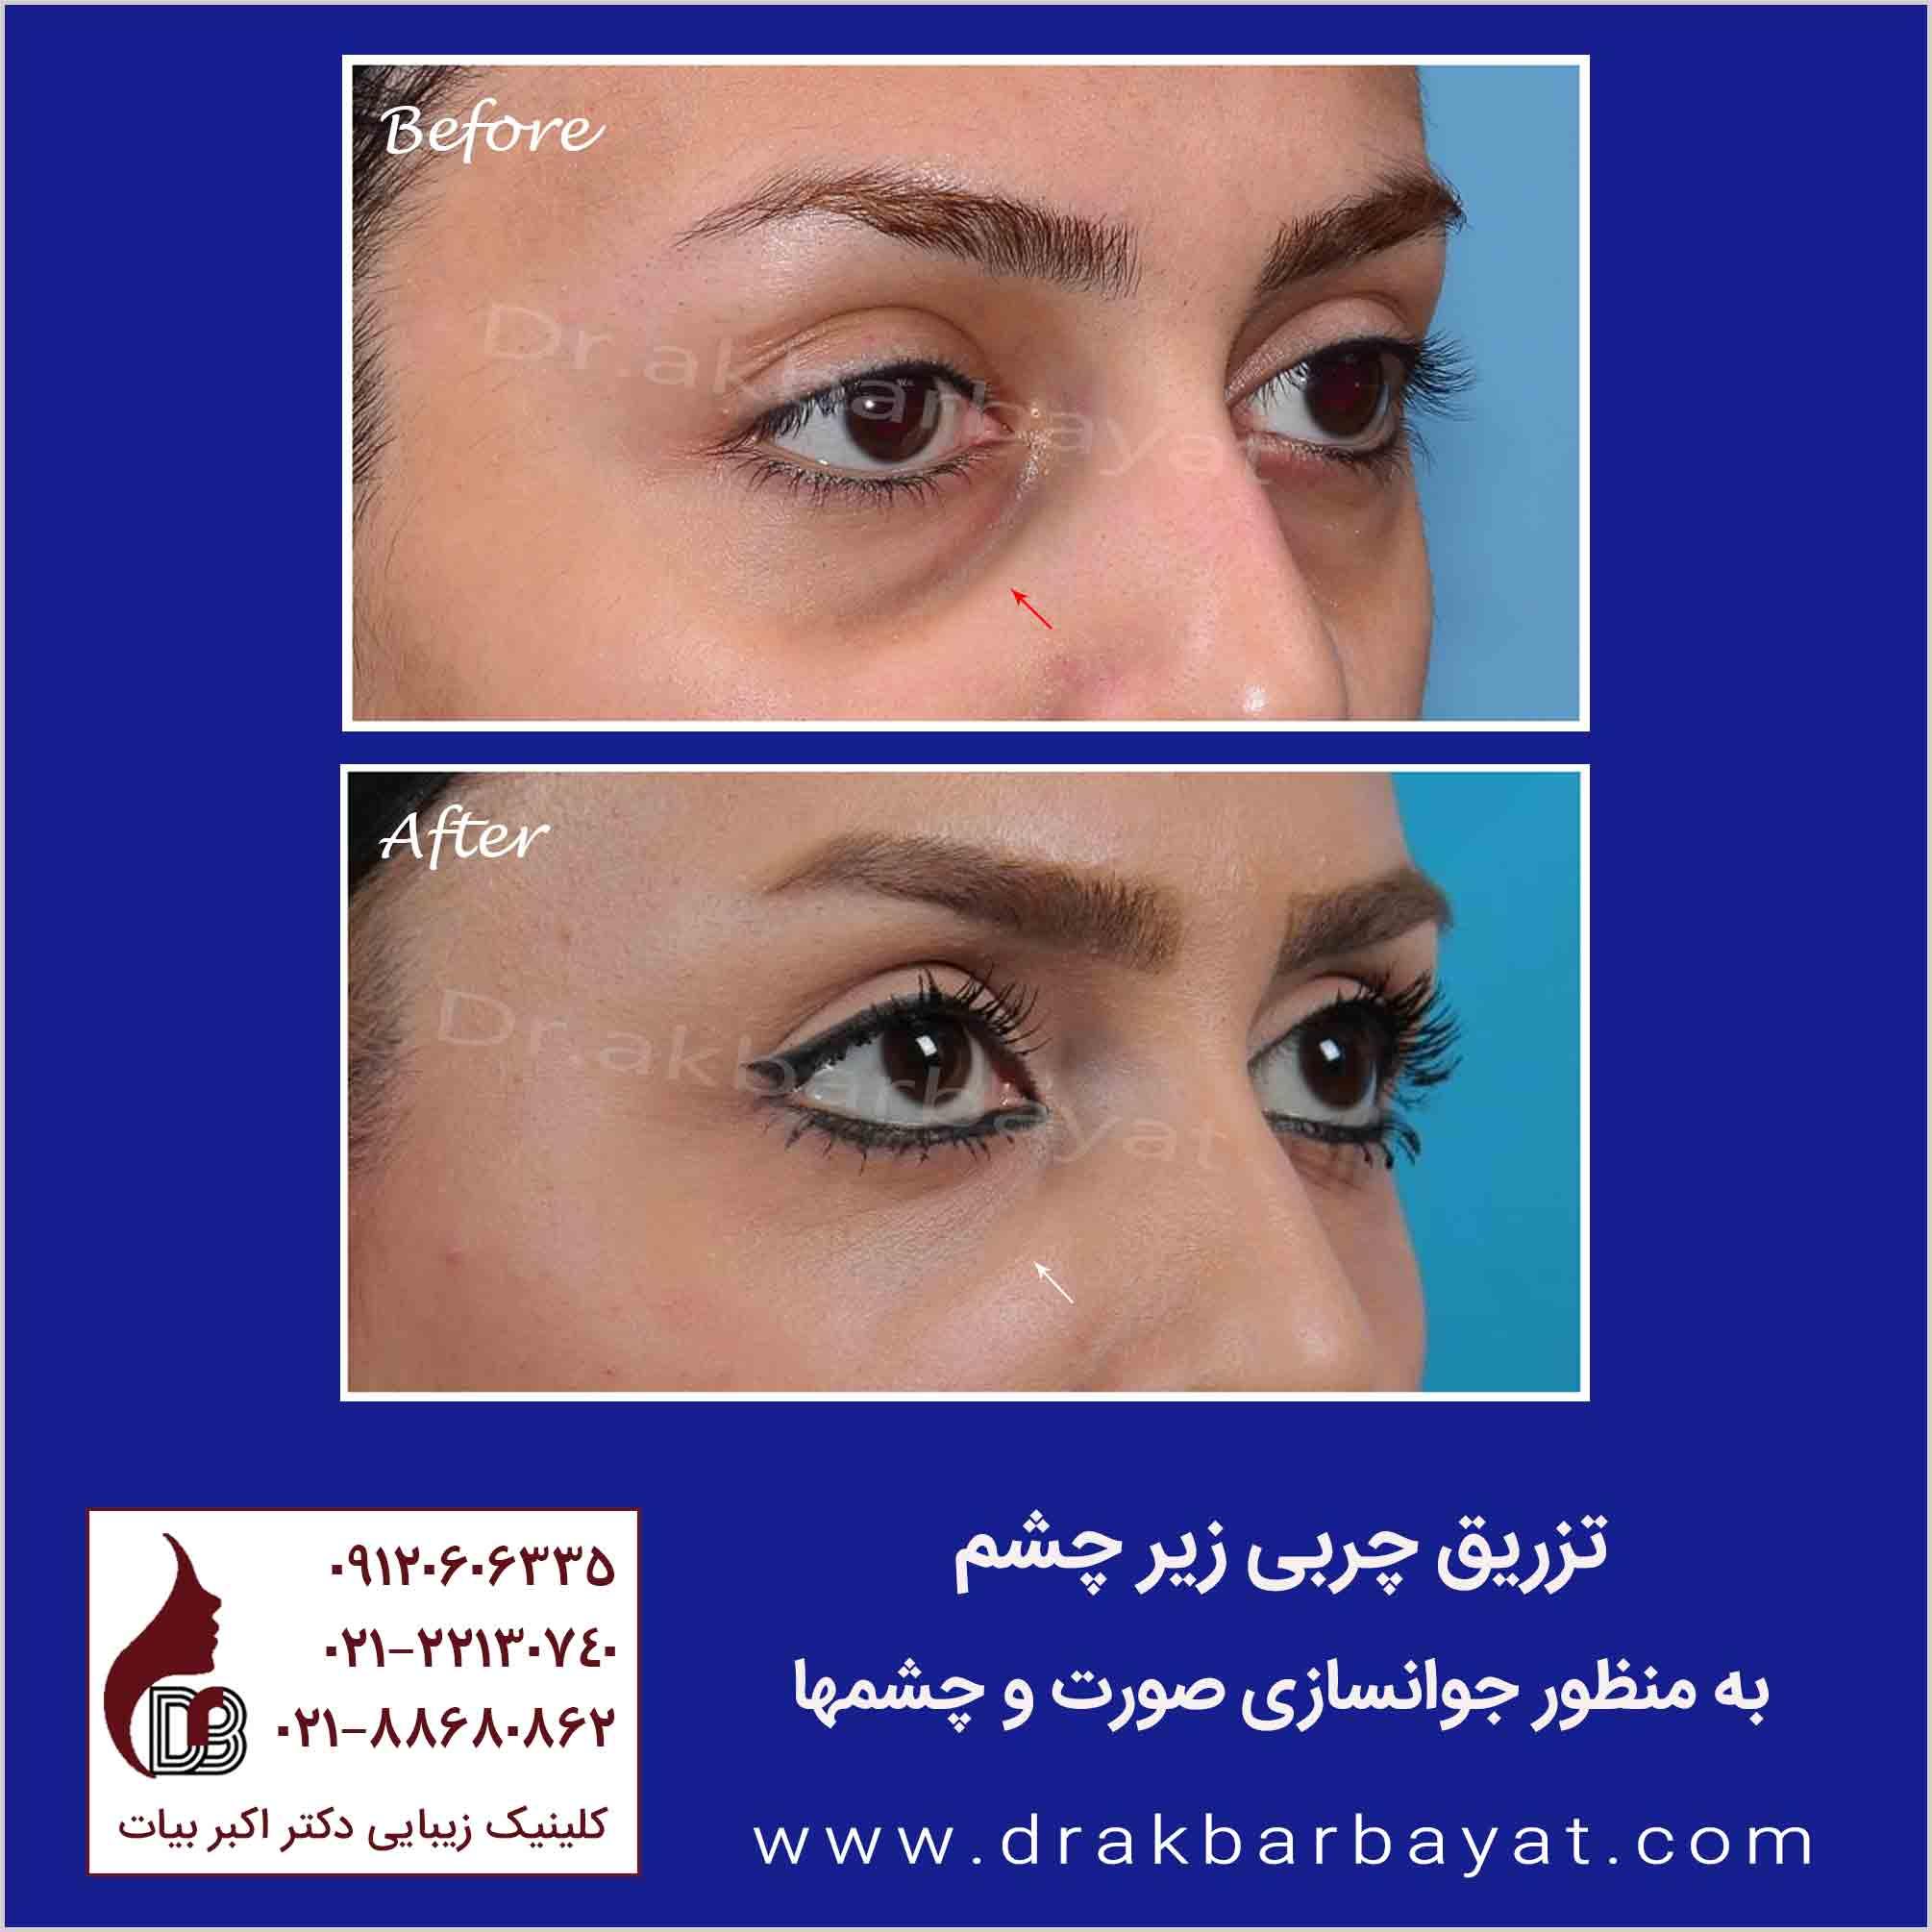 تزریق چربی زیر چشم | مرکز تزریق چربی